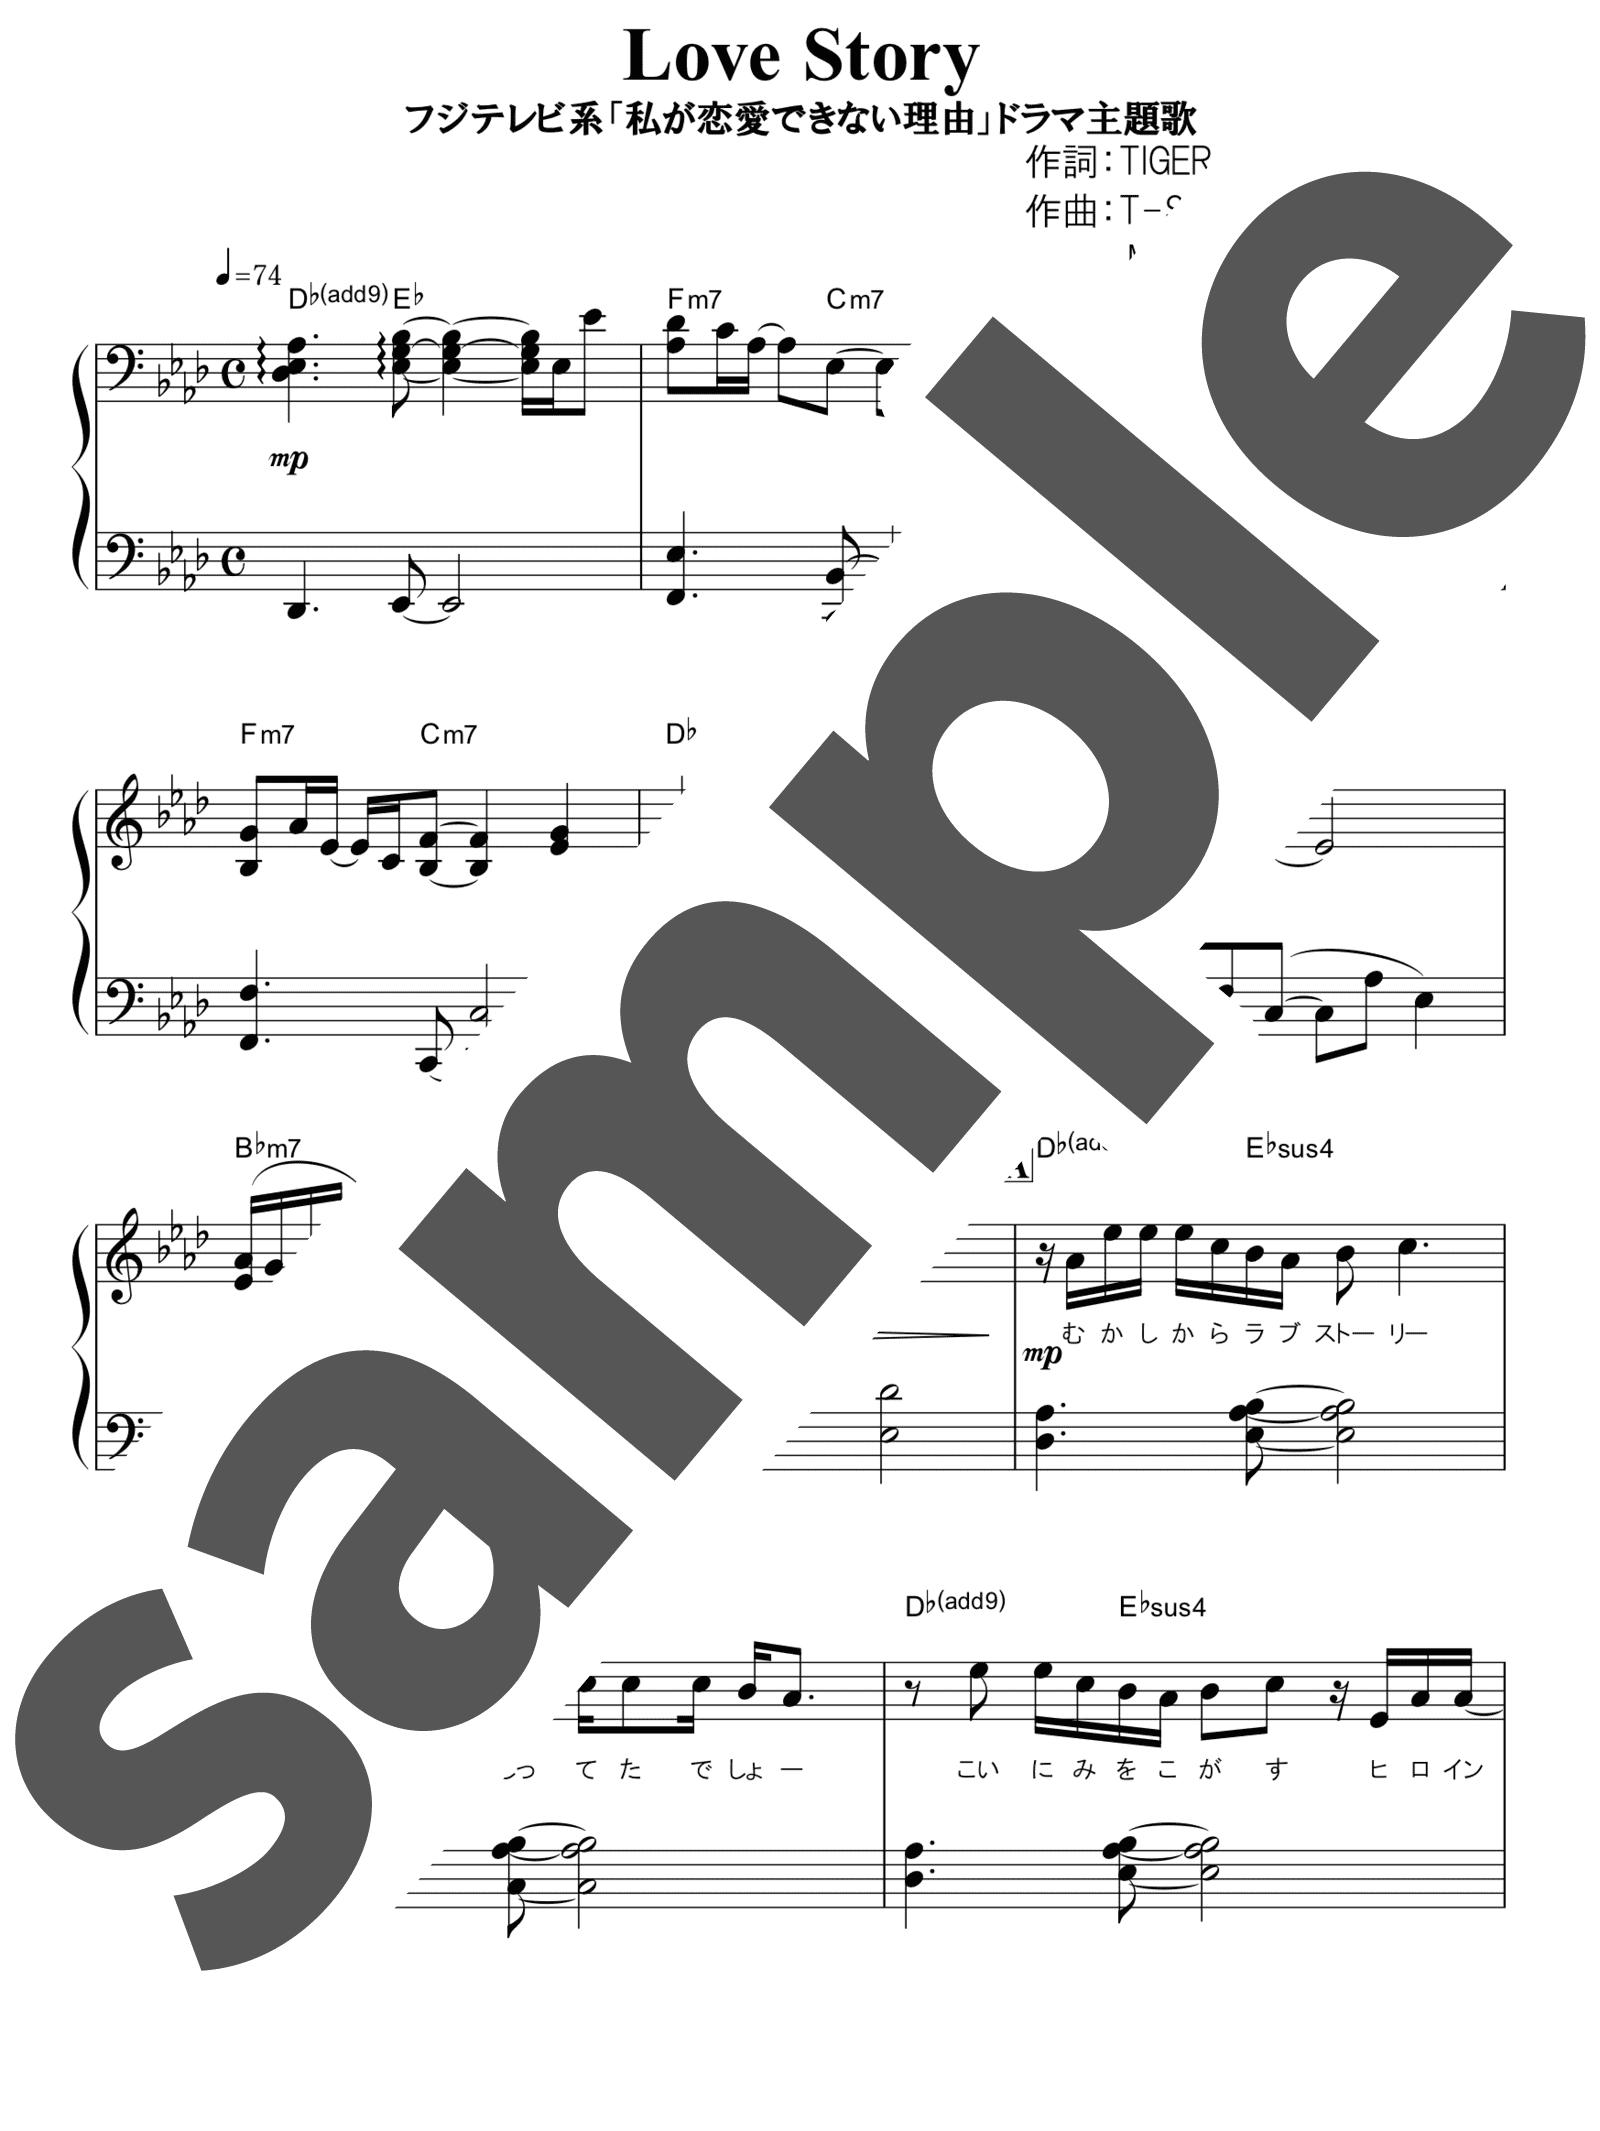 「Love Story」のサンプル楽譜